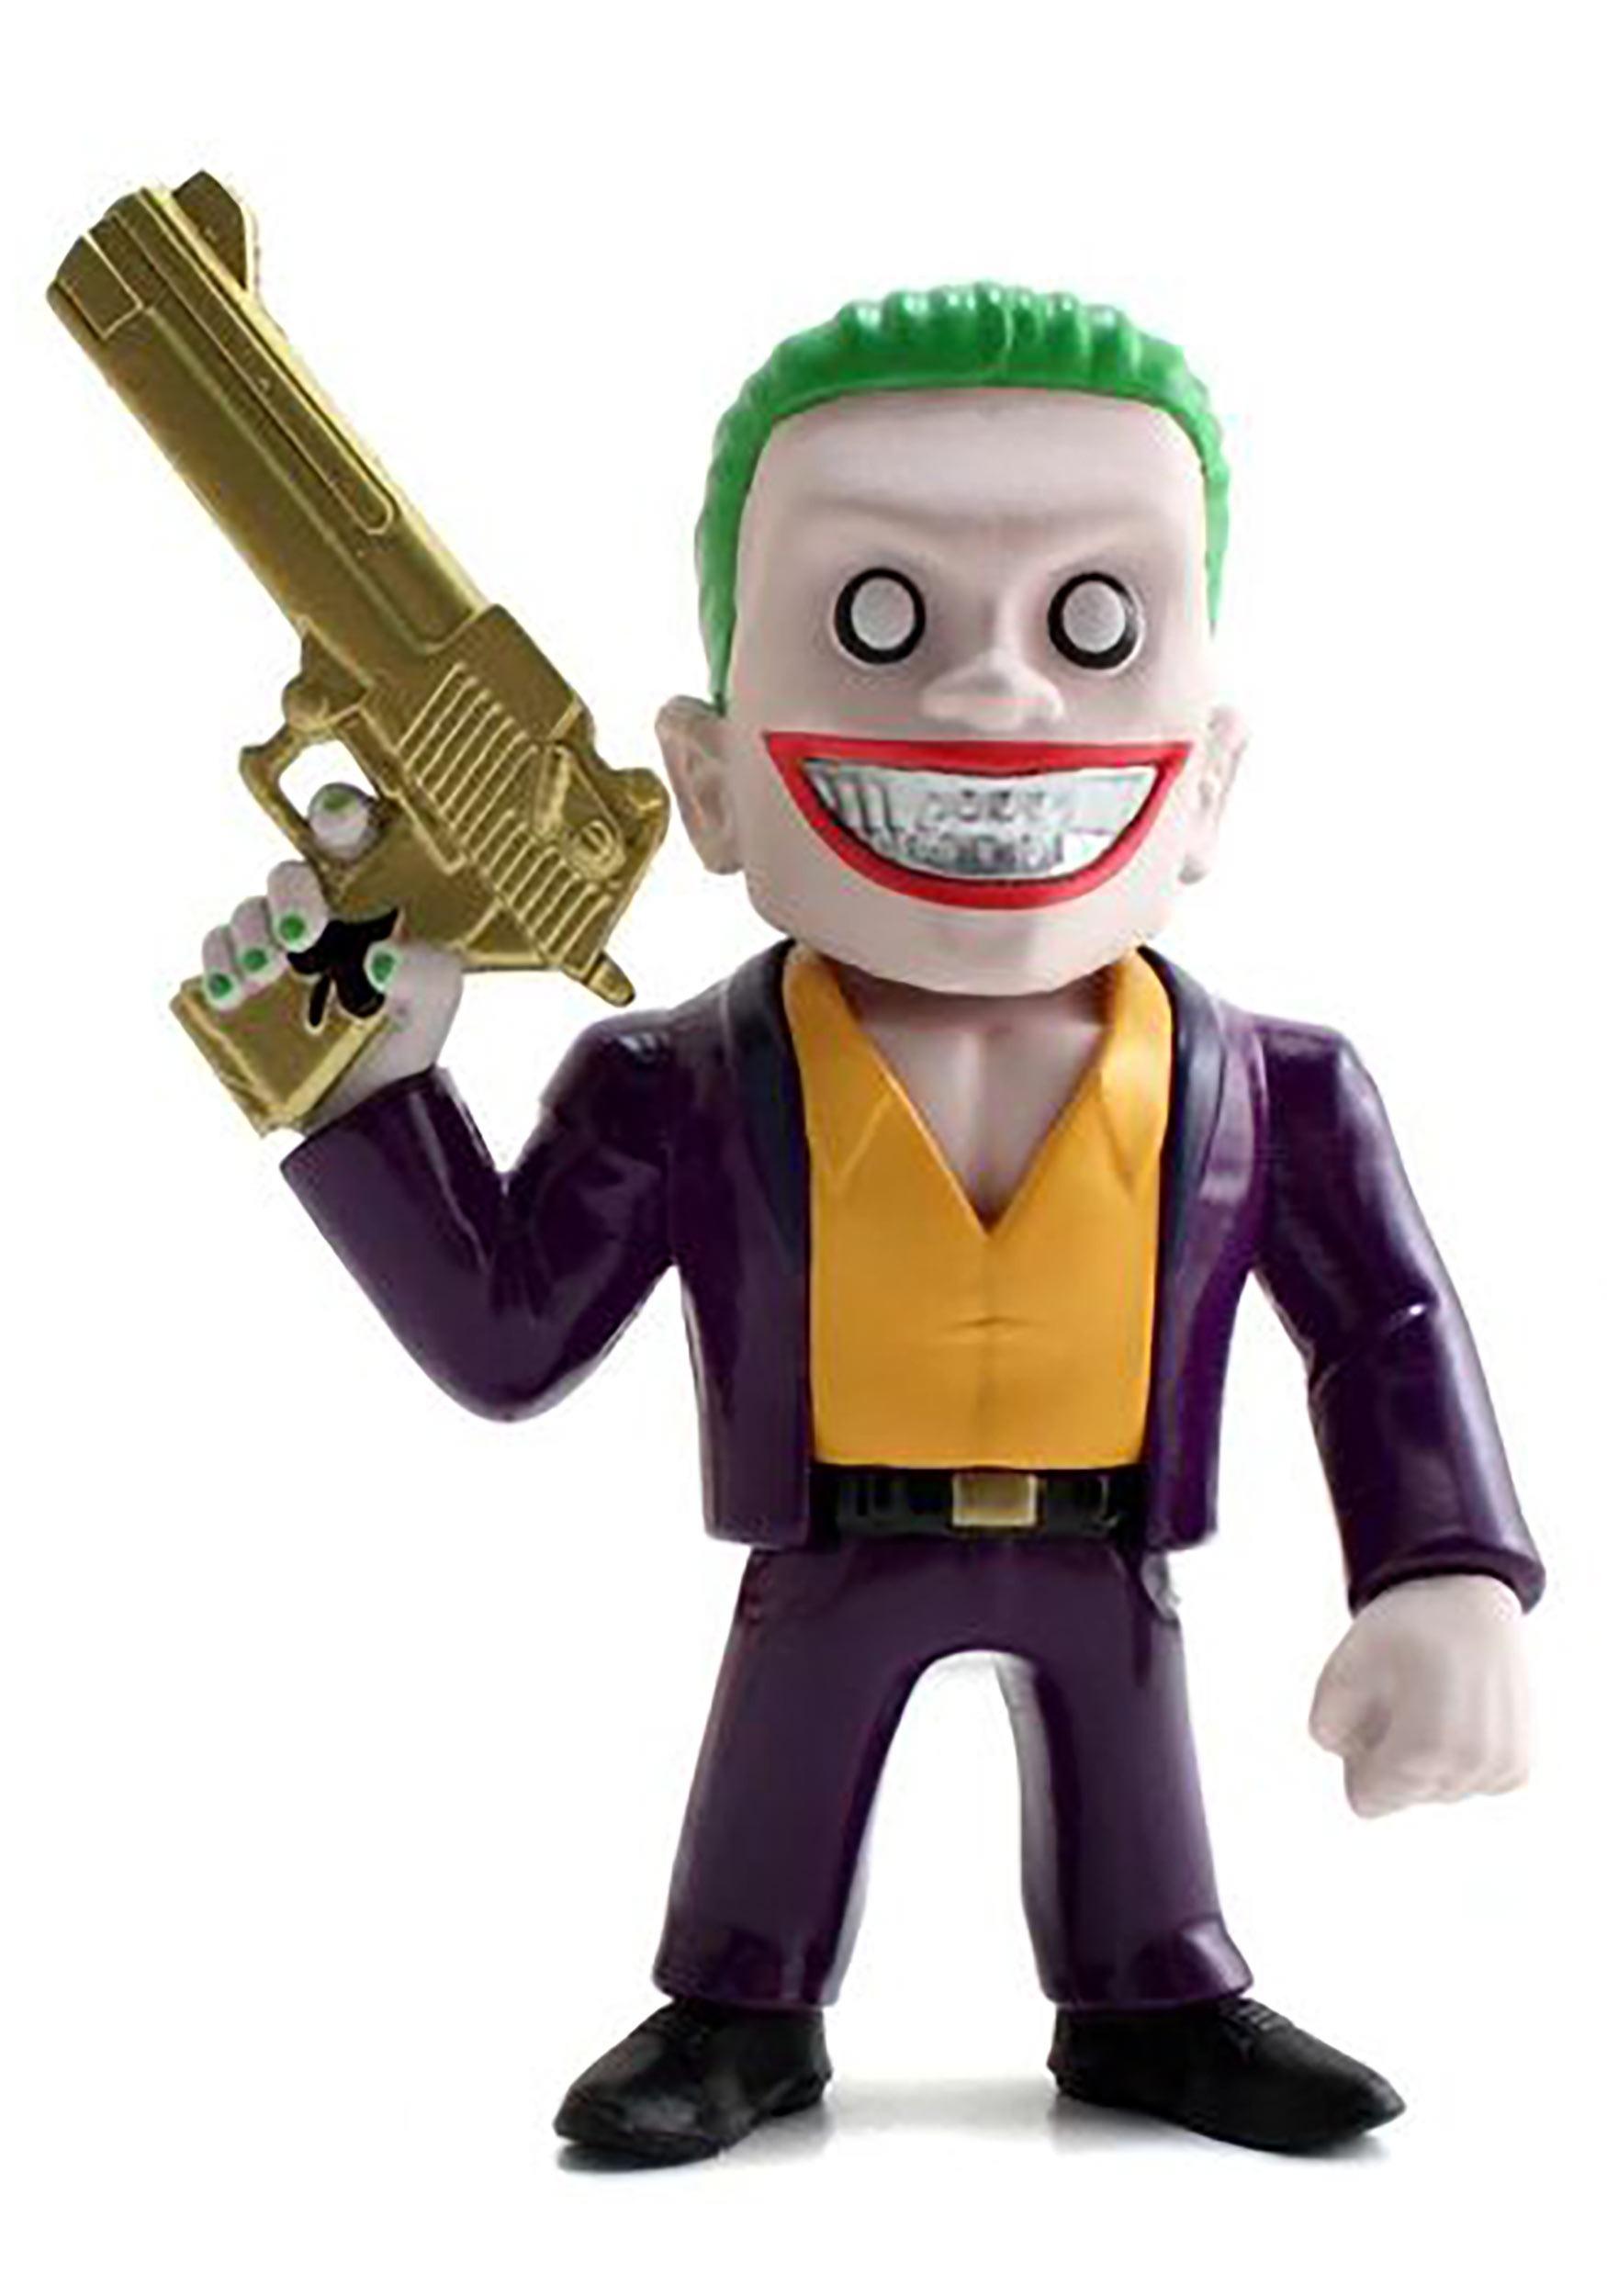 Suicide Squad Joker & Harley Quinn 4